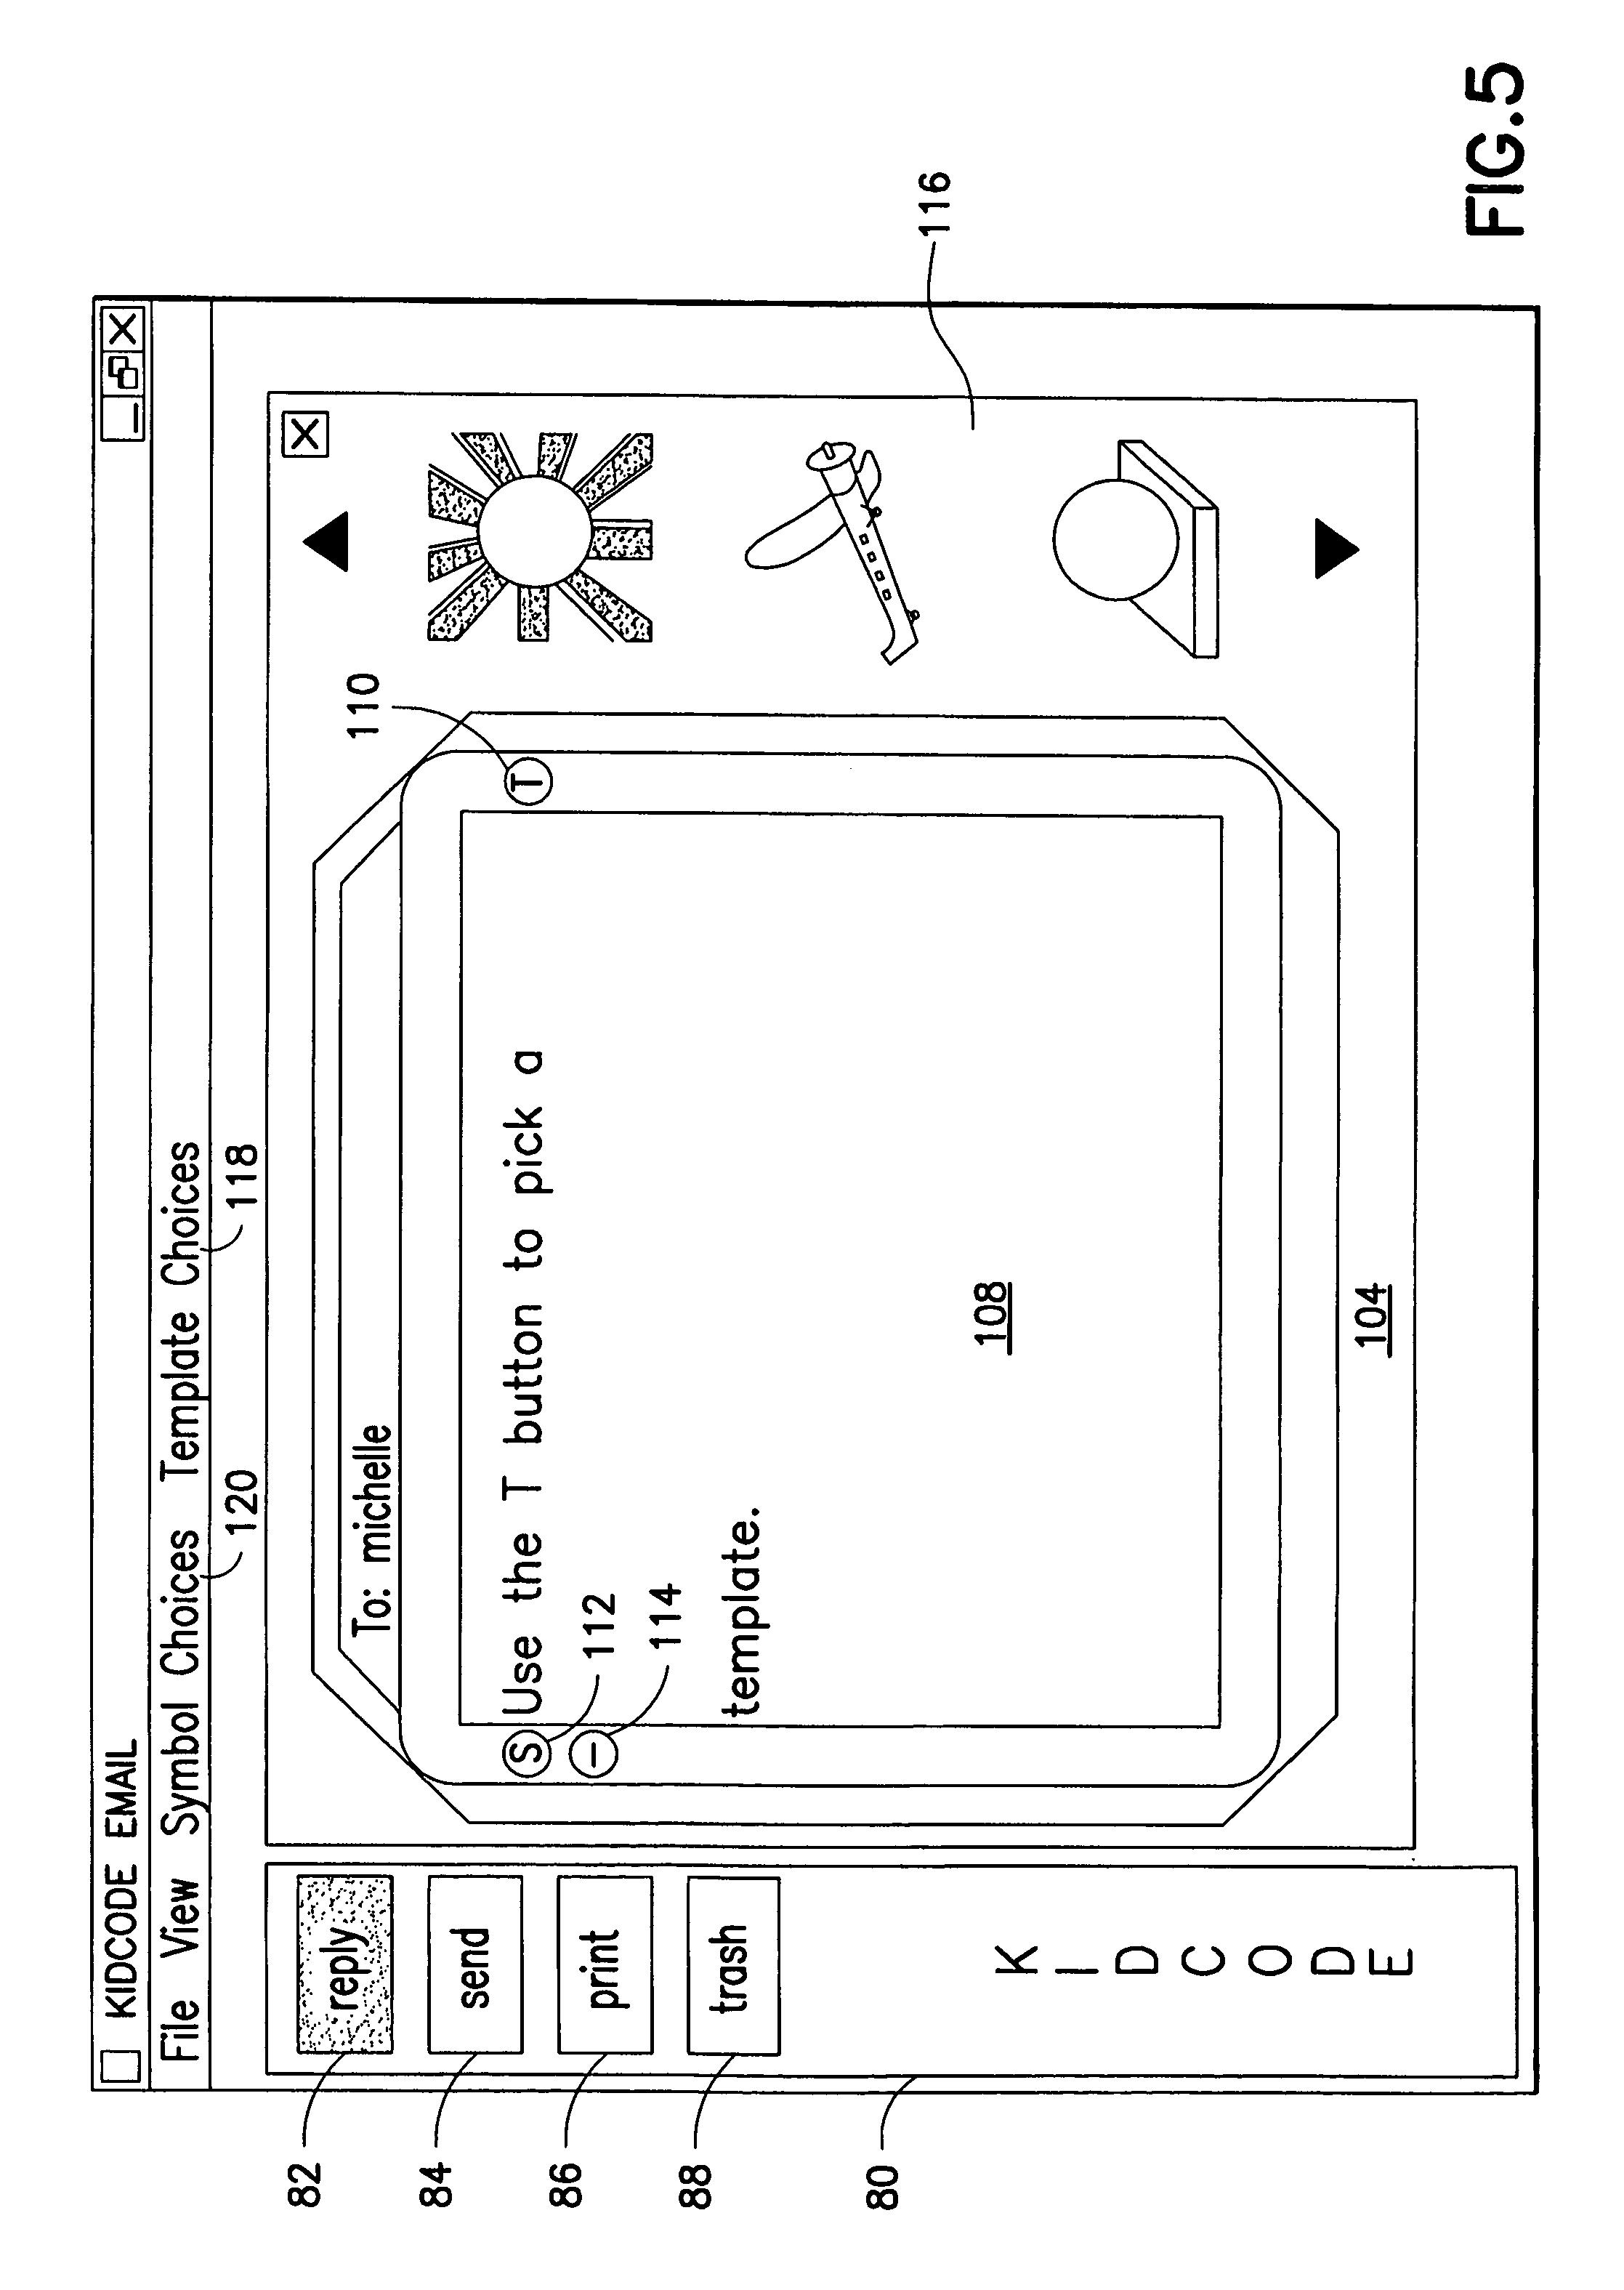 Patent Us 7076730 B1 Auto Wiring Diagram Symbols Furthermore Excel Worksheet Java